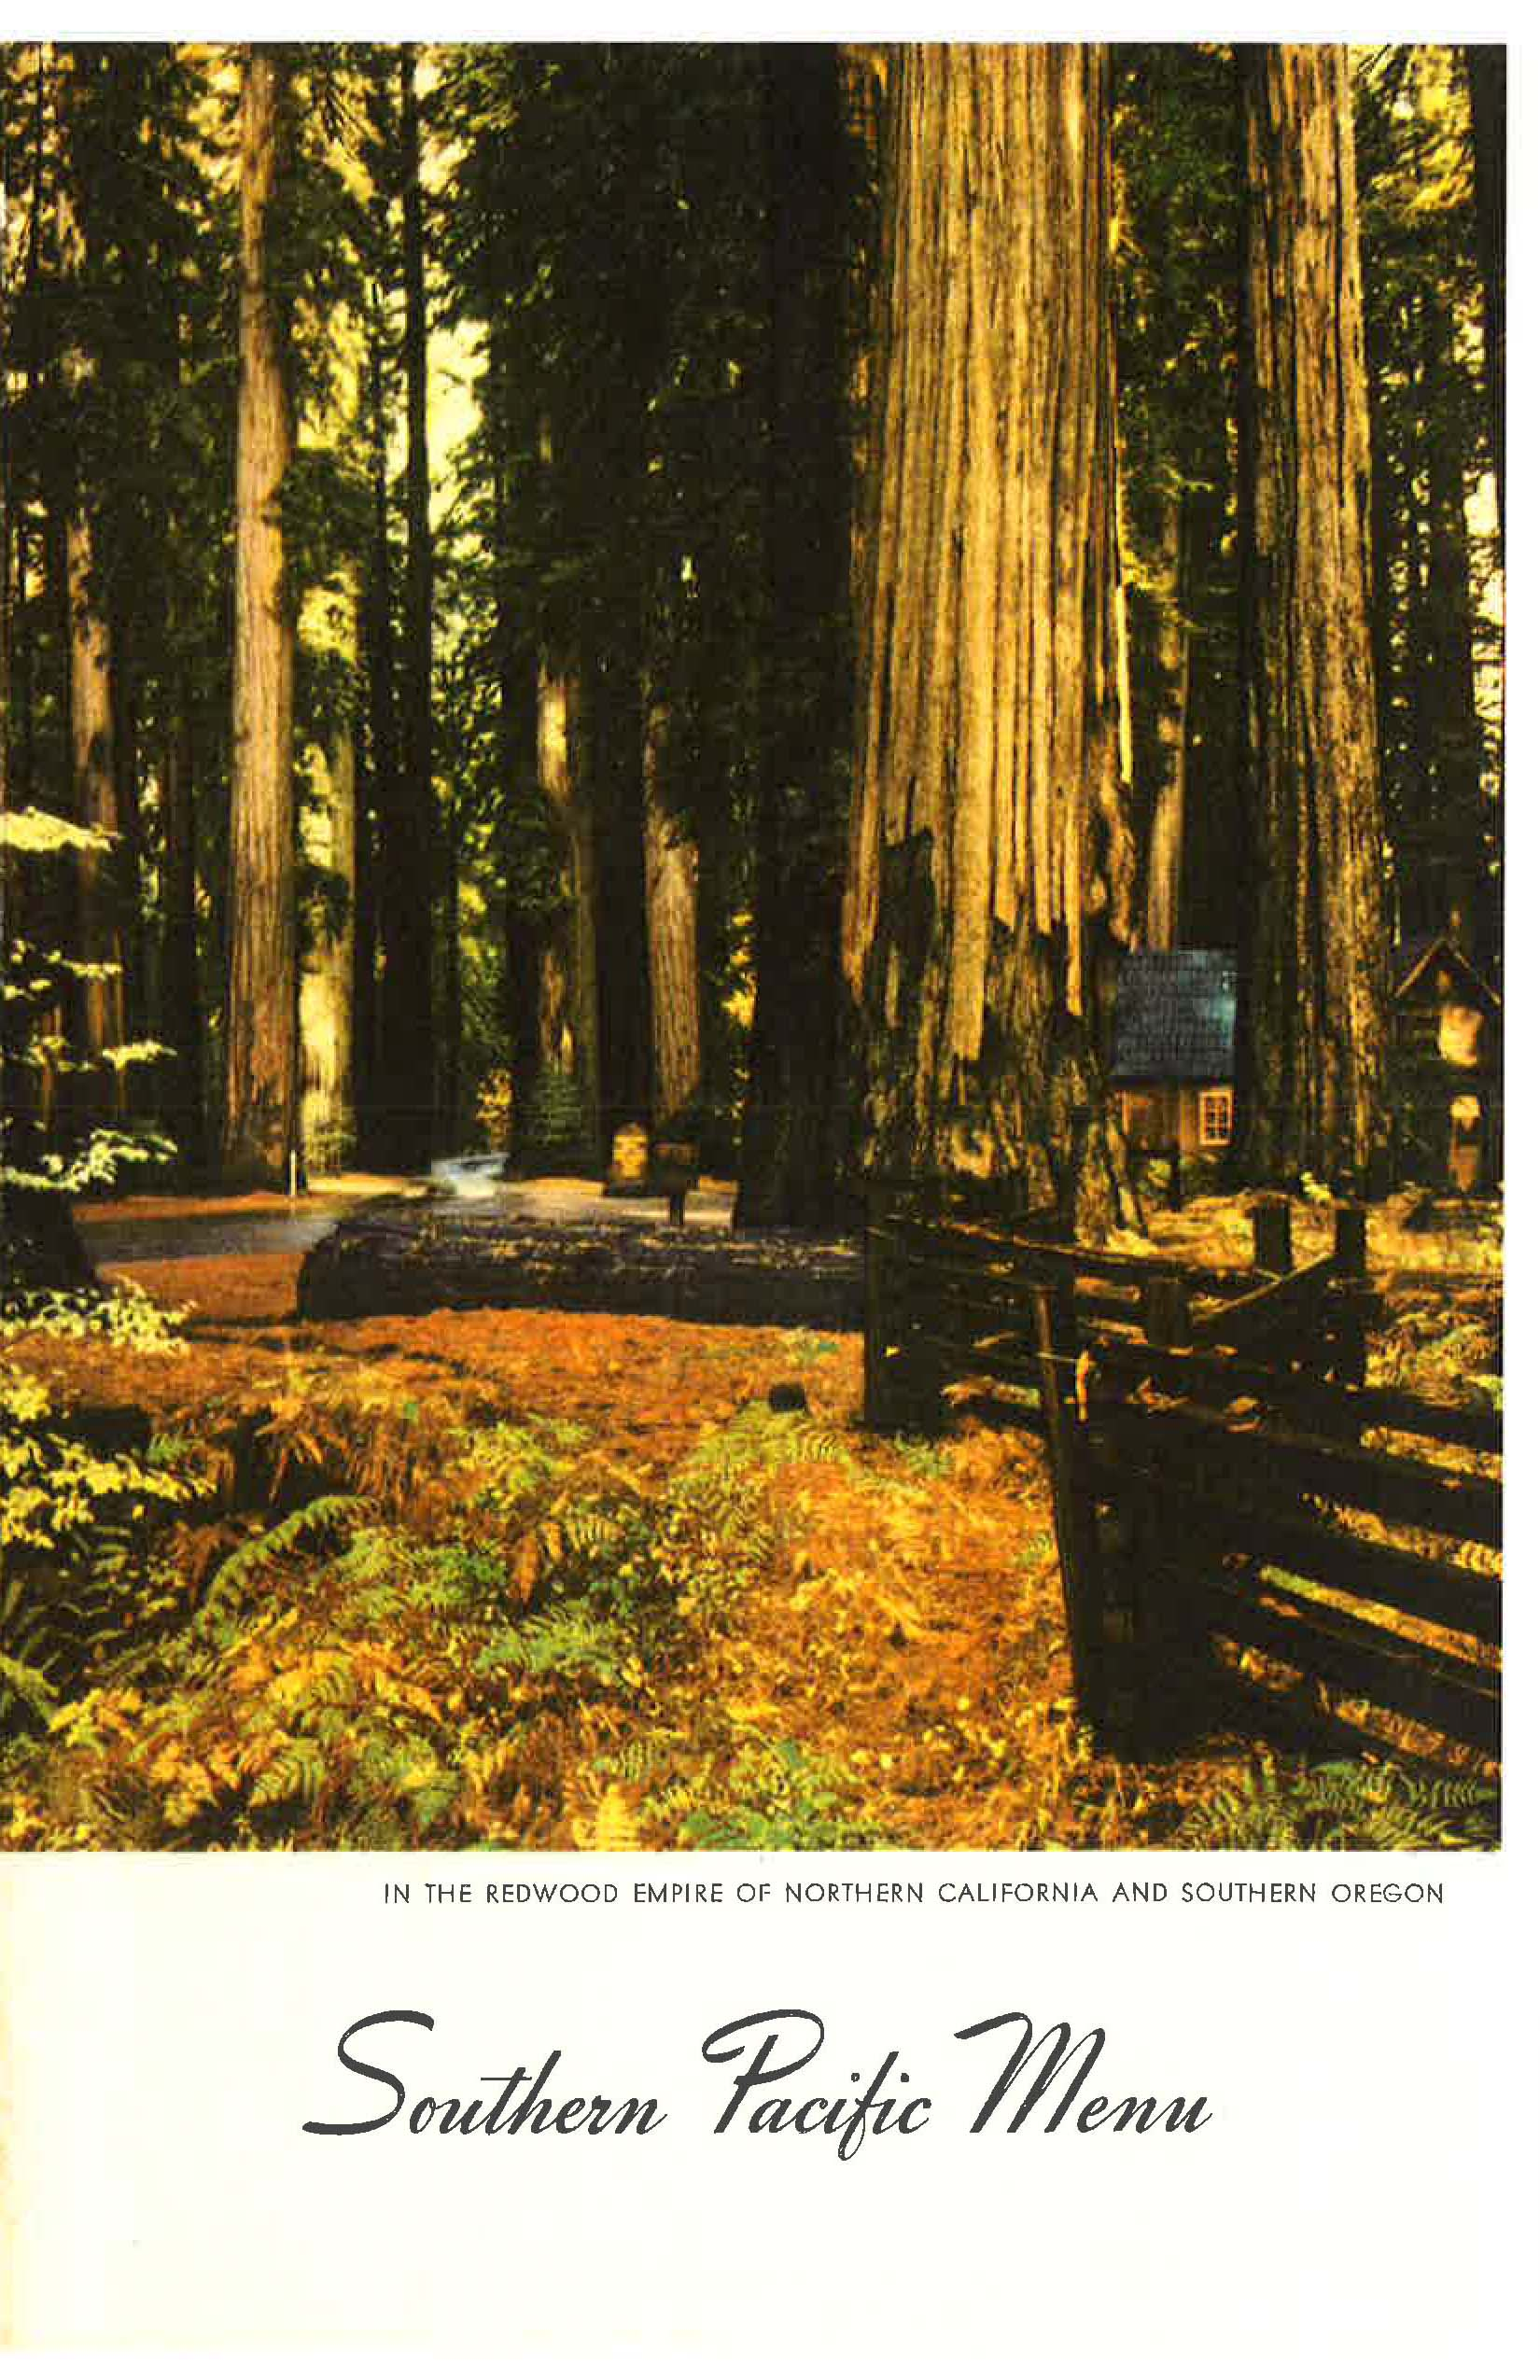 SP+In+the+Redwood+Empire+Ofern+Oregon+Dinner+Menu+7-48 1a.jpg